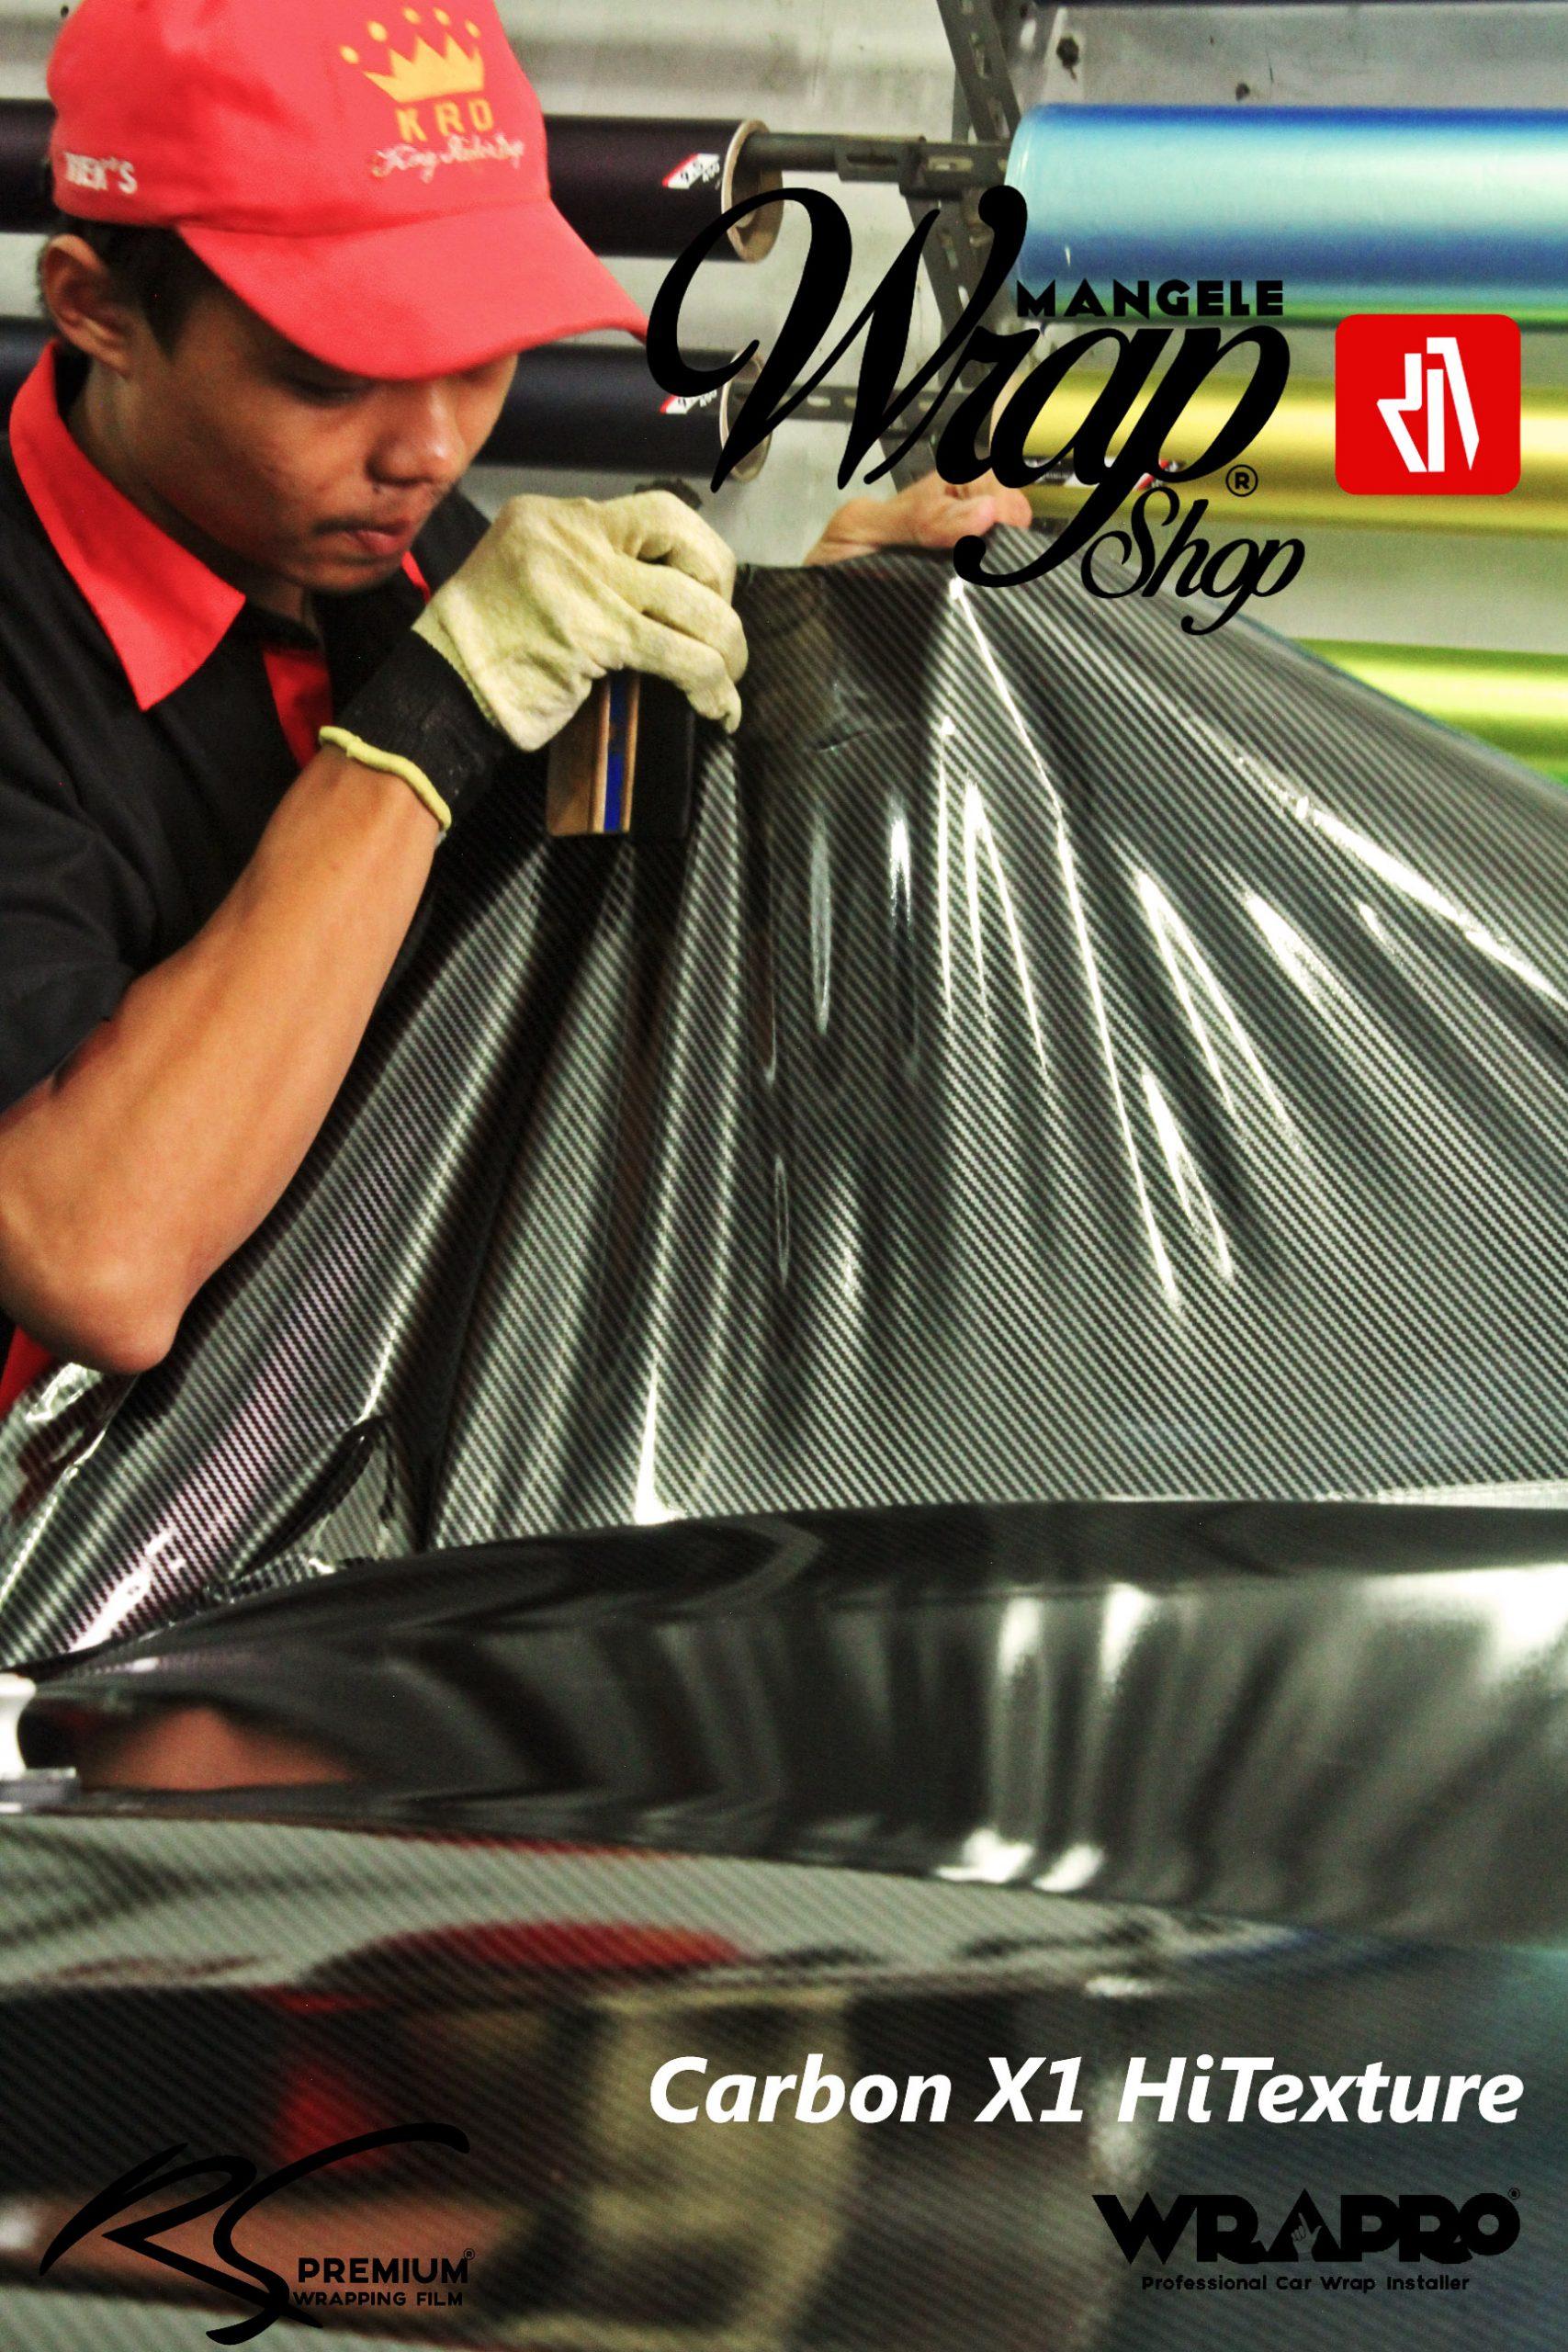 MANGELE Stiker Carbon X1 HiTexture Gloss Motor Mobil Bisa